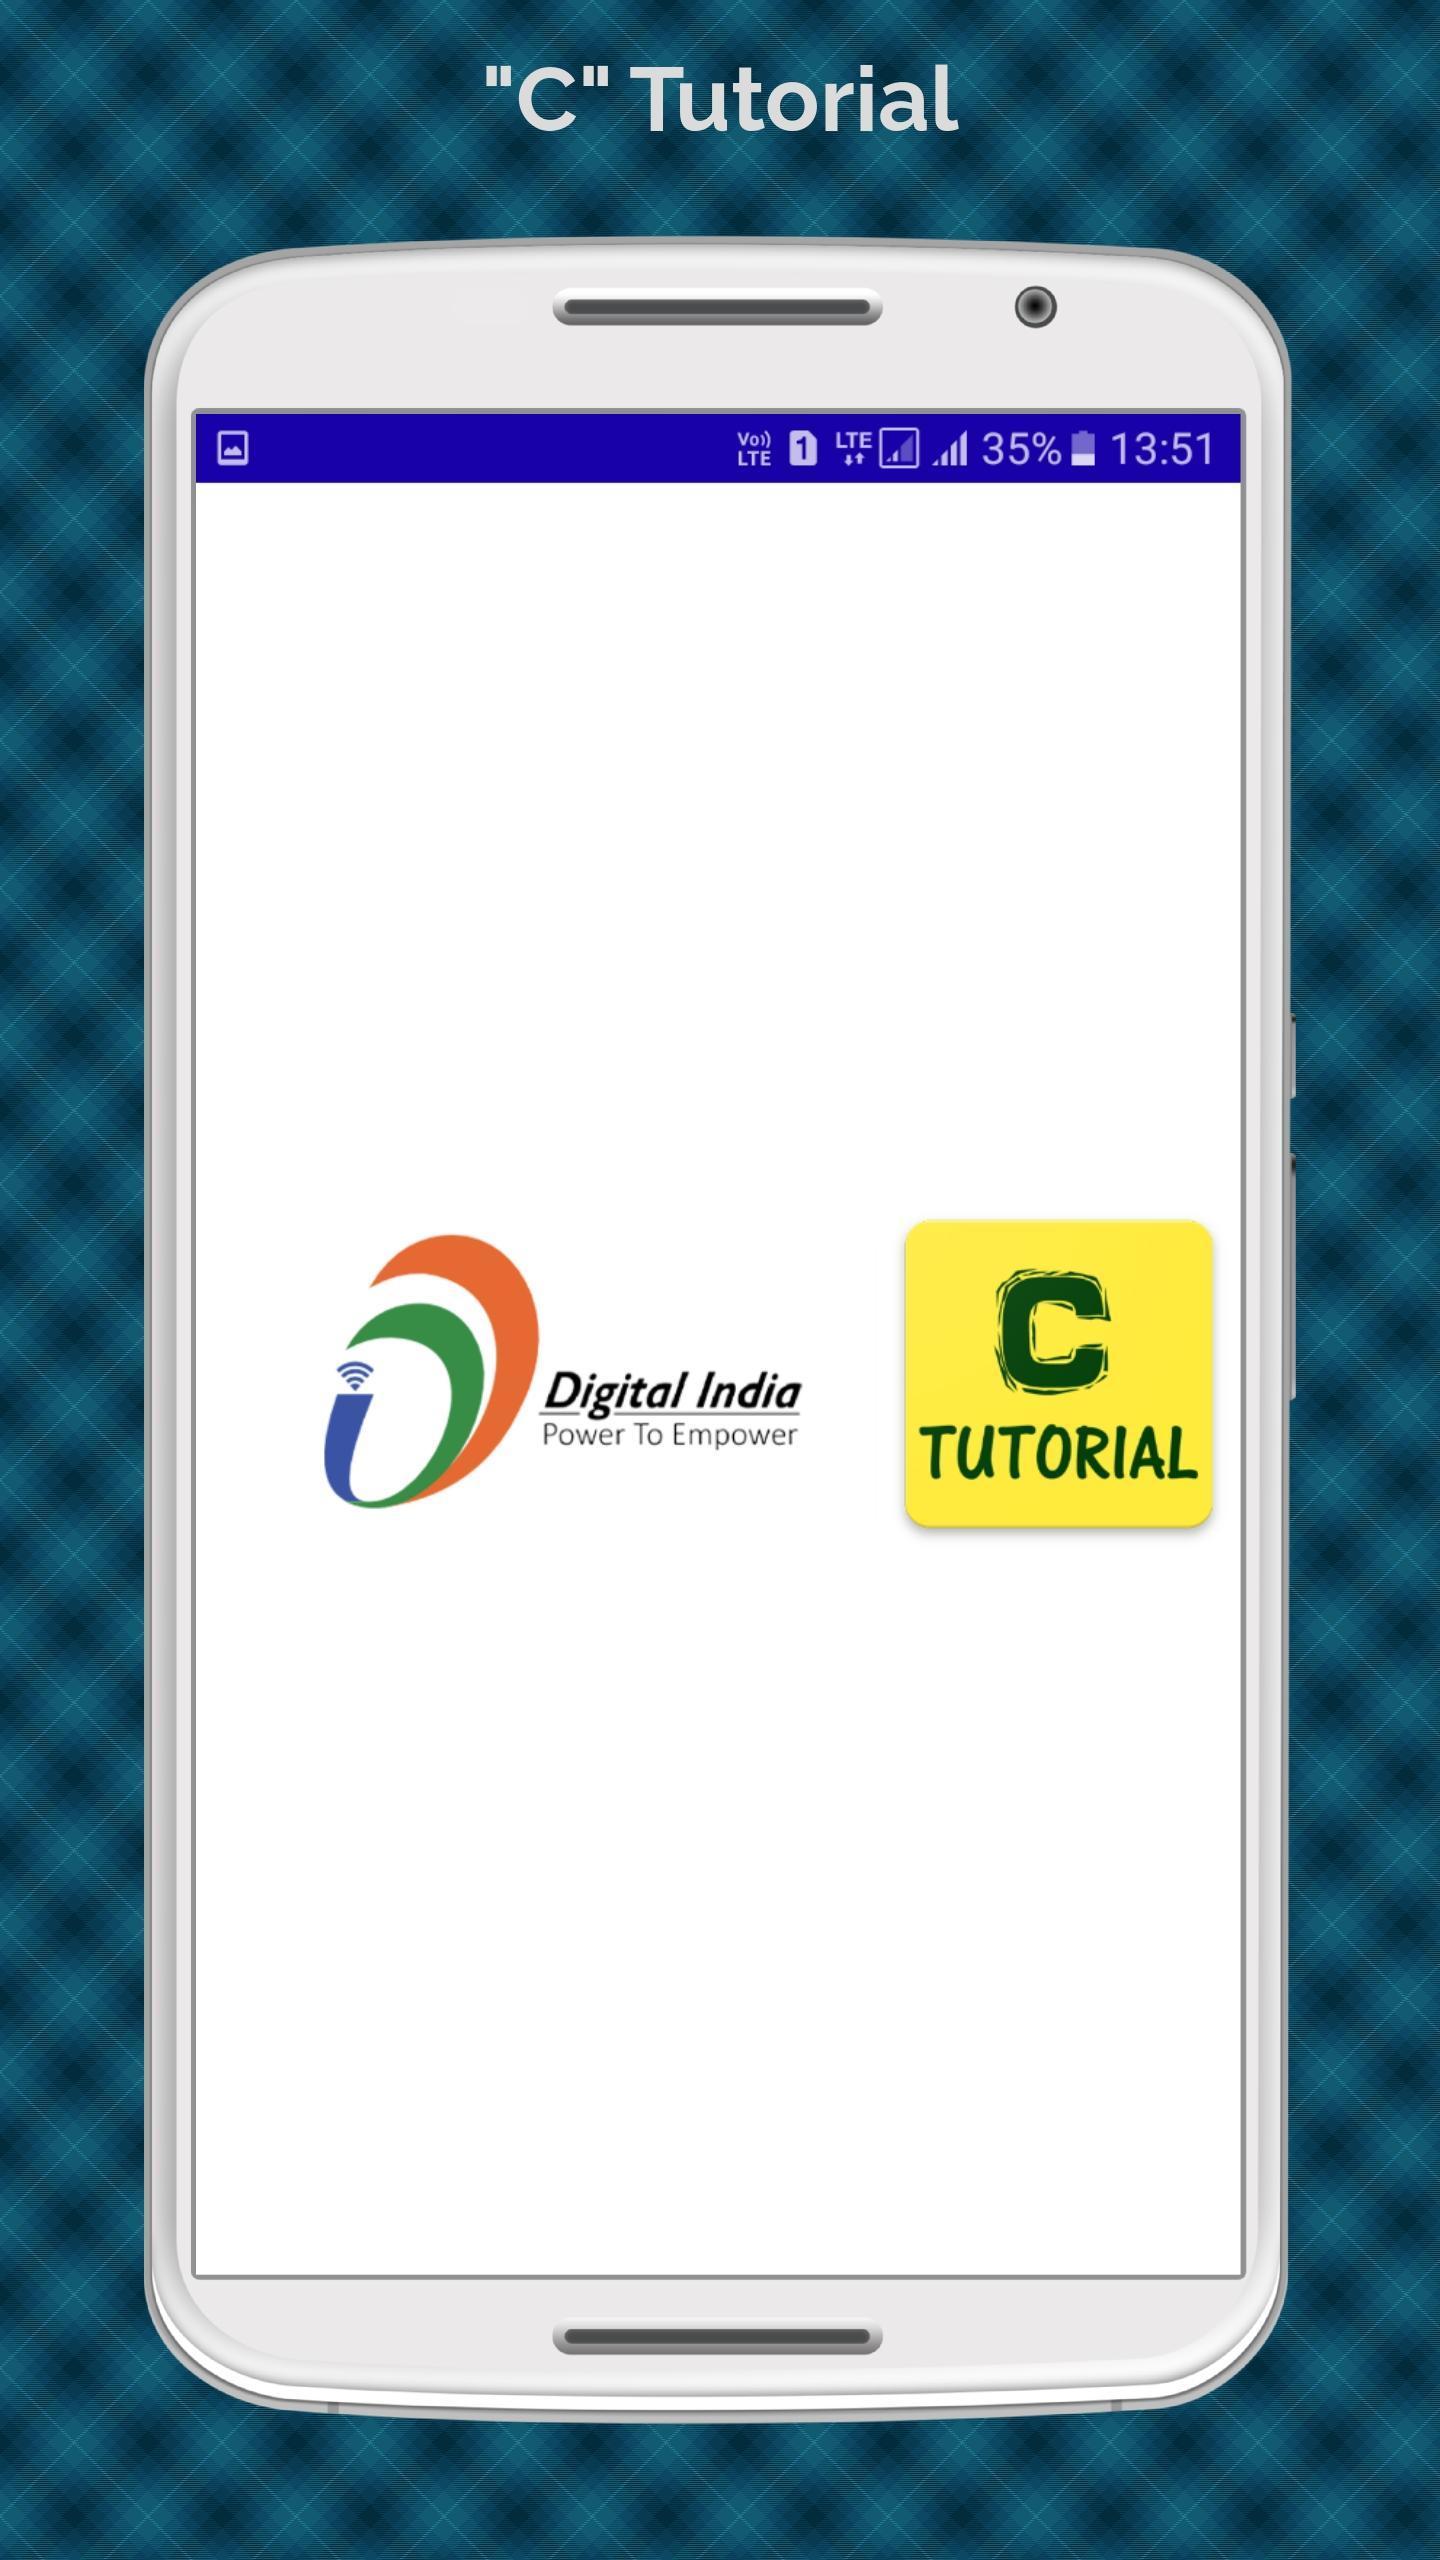 C Programming language Tutorial Offline App for Android